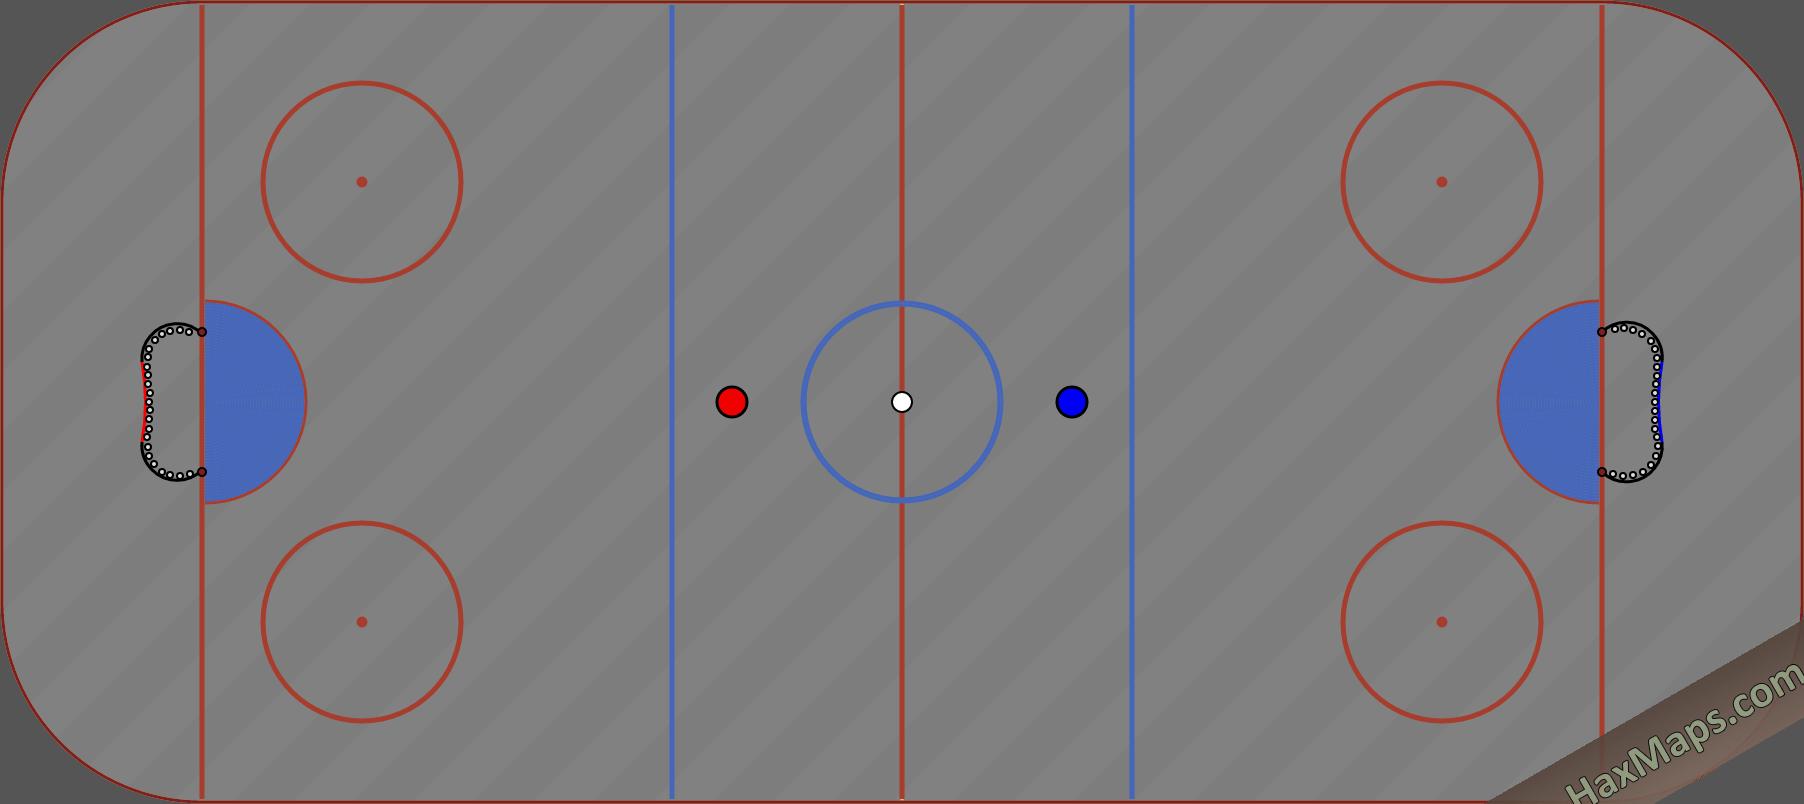 hax ball maps | Hockey by NATSU Edit